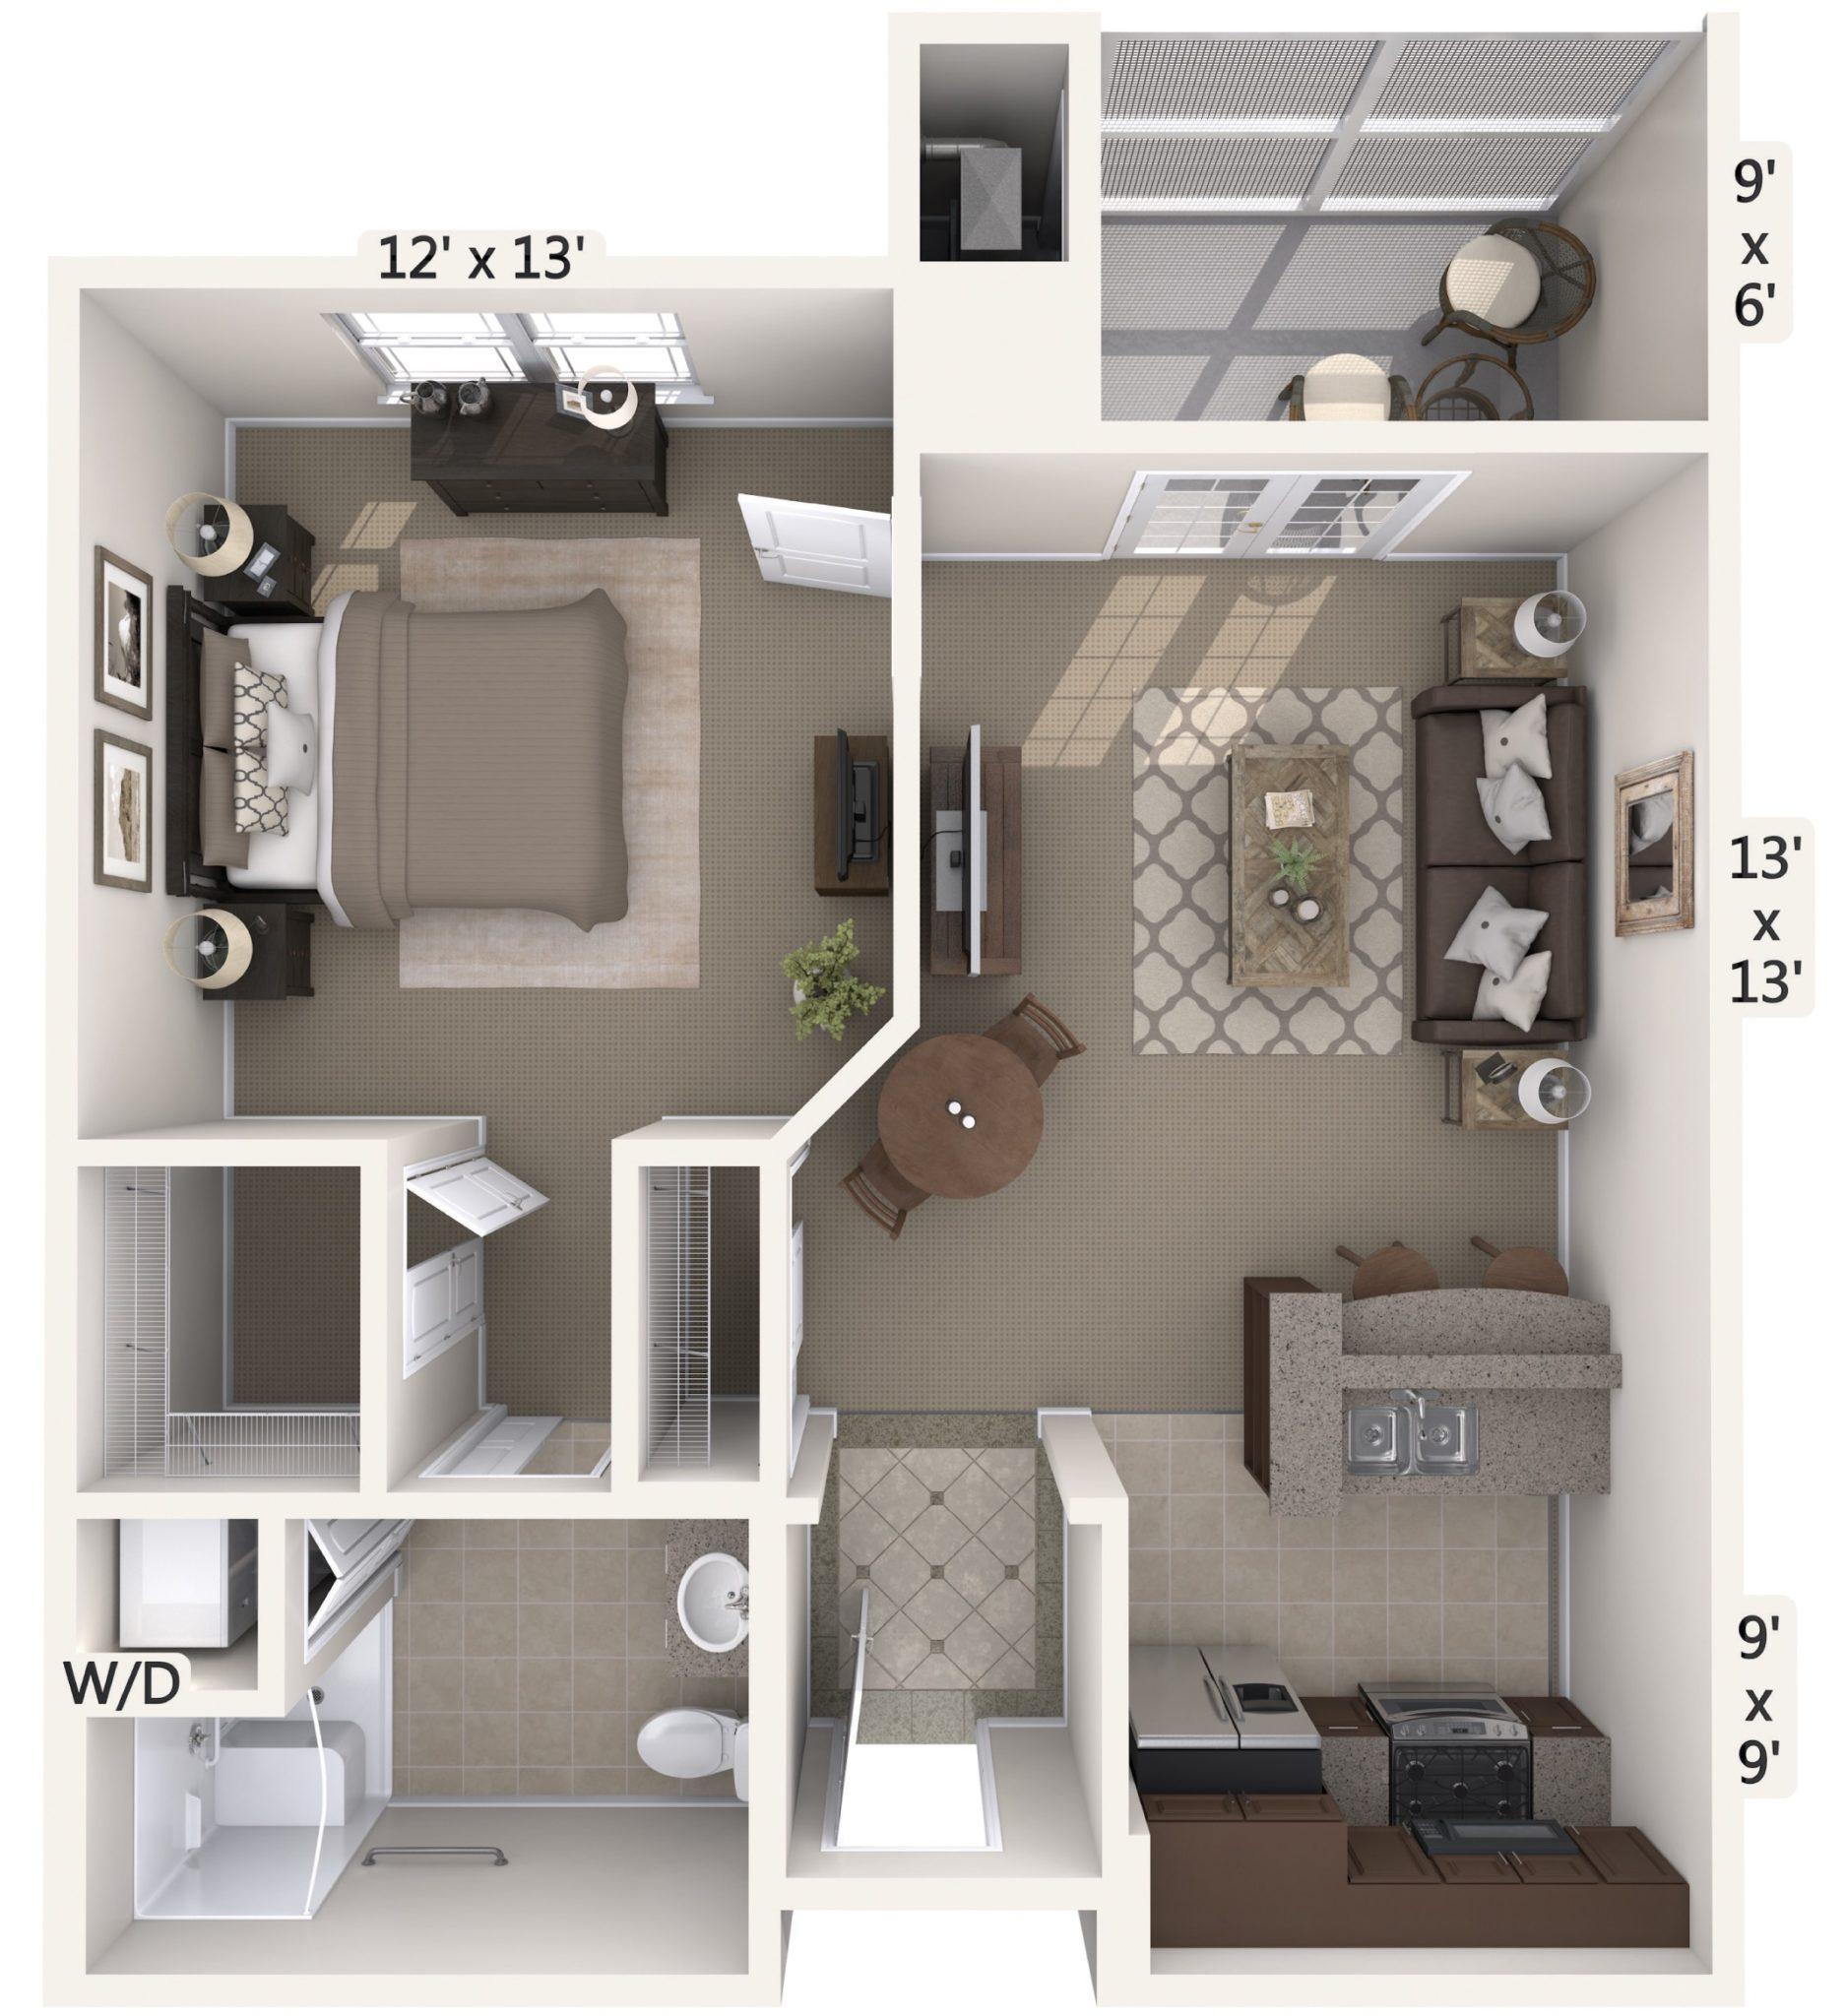 AddingtonPlace_One-Bedroom-Harmony_714-sq.-ft._IL_Stuart-1874x2048